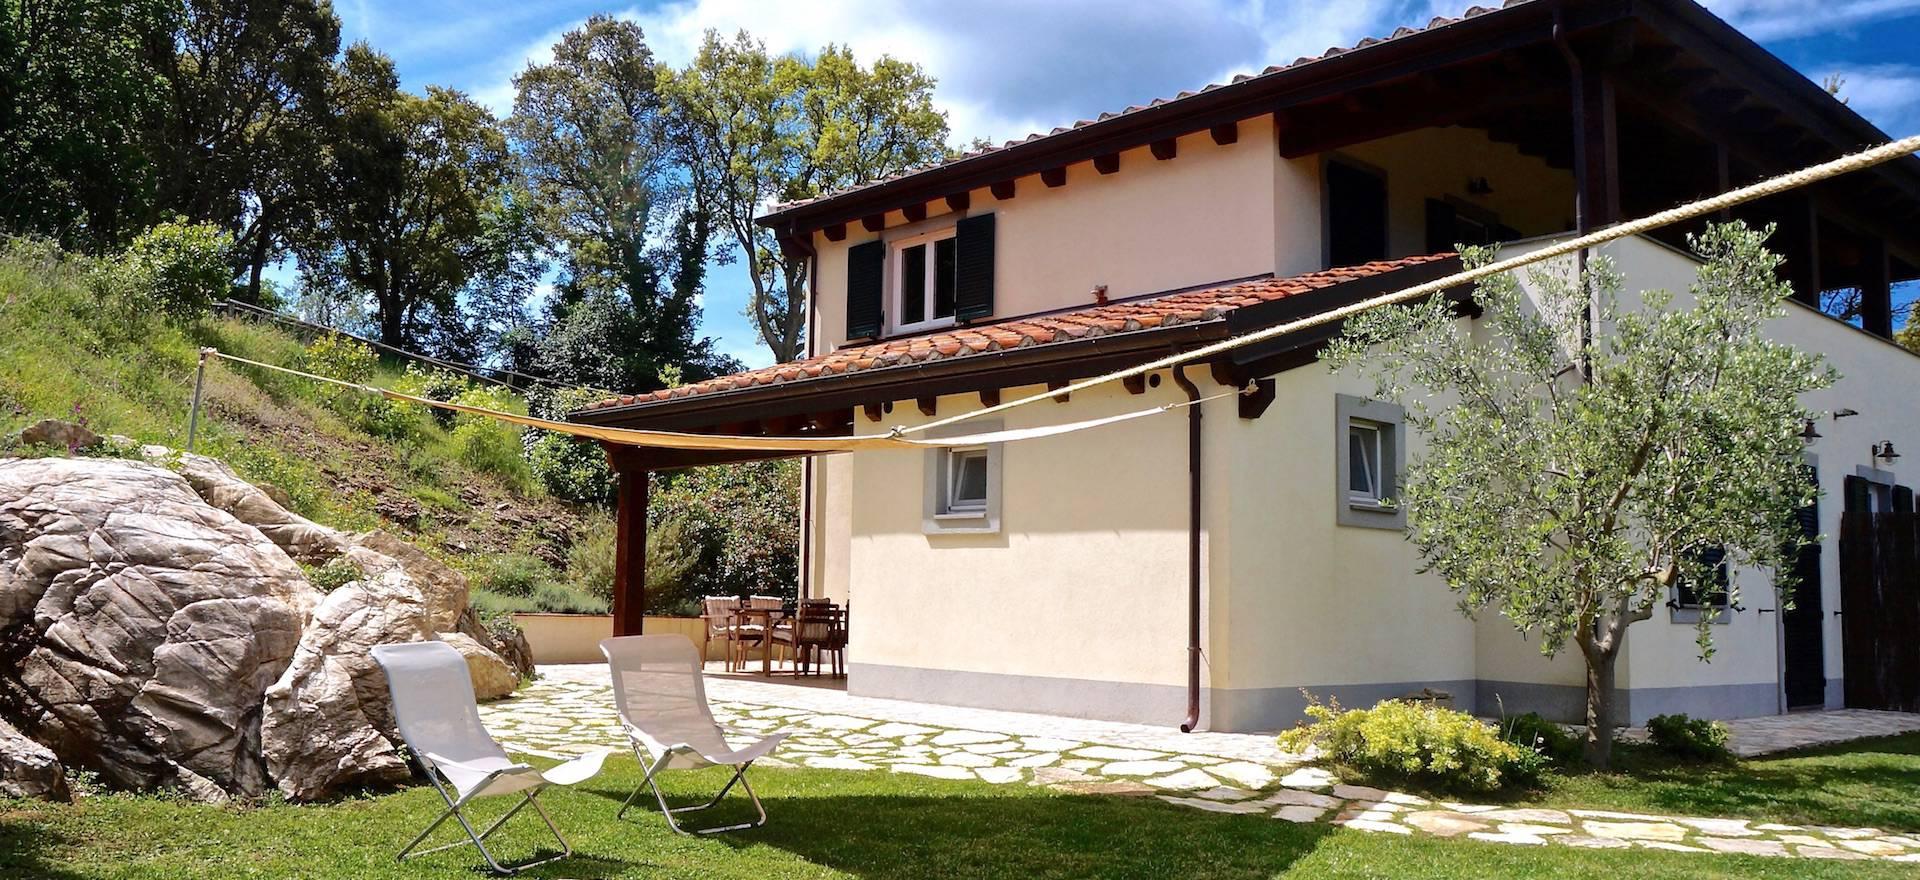 Agriturismo Toscane Agriturismo in Toscane met comfortabele en luxe huizen